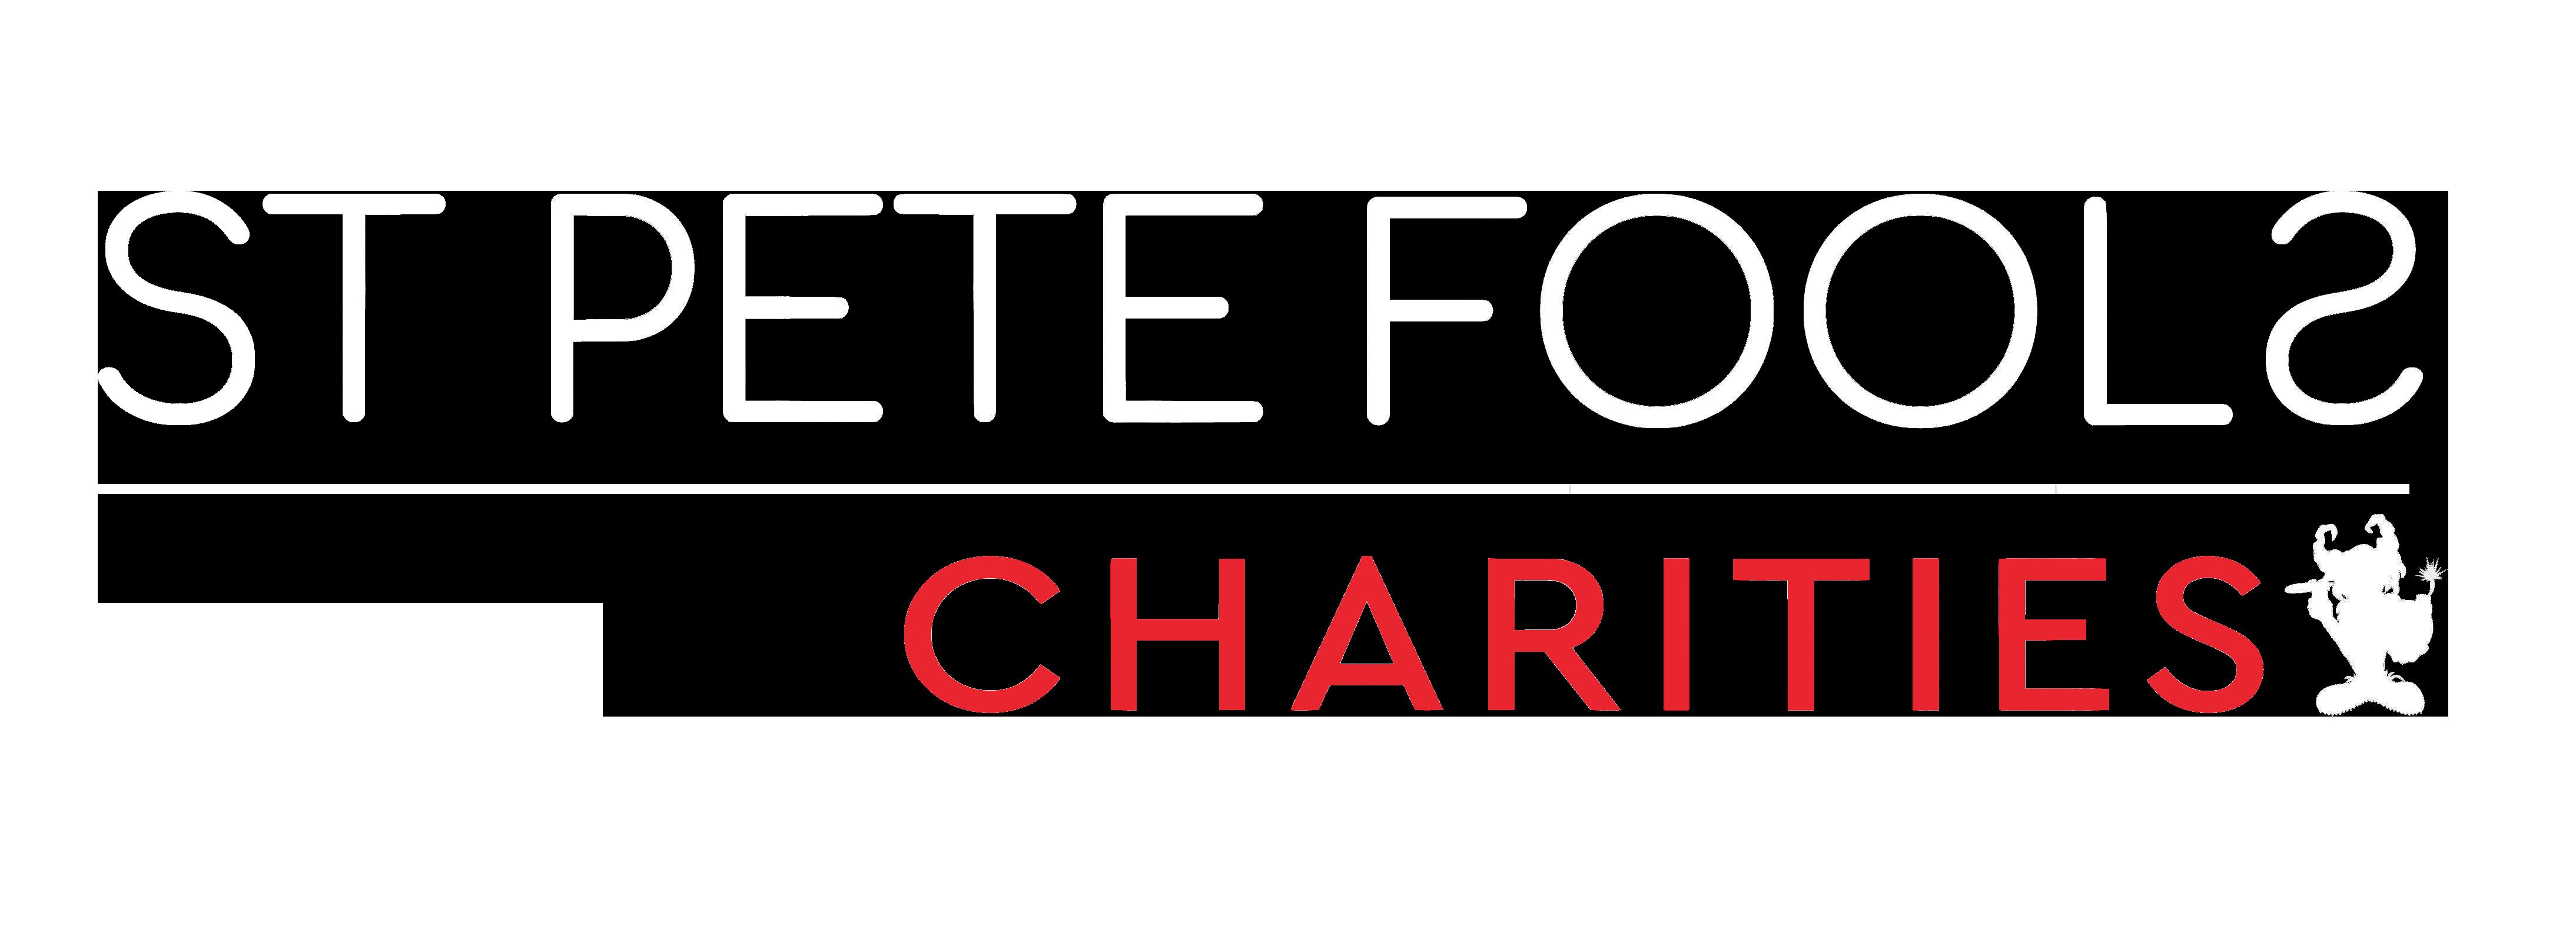 St. Pete Fools Charities